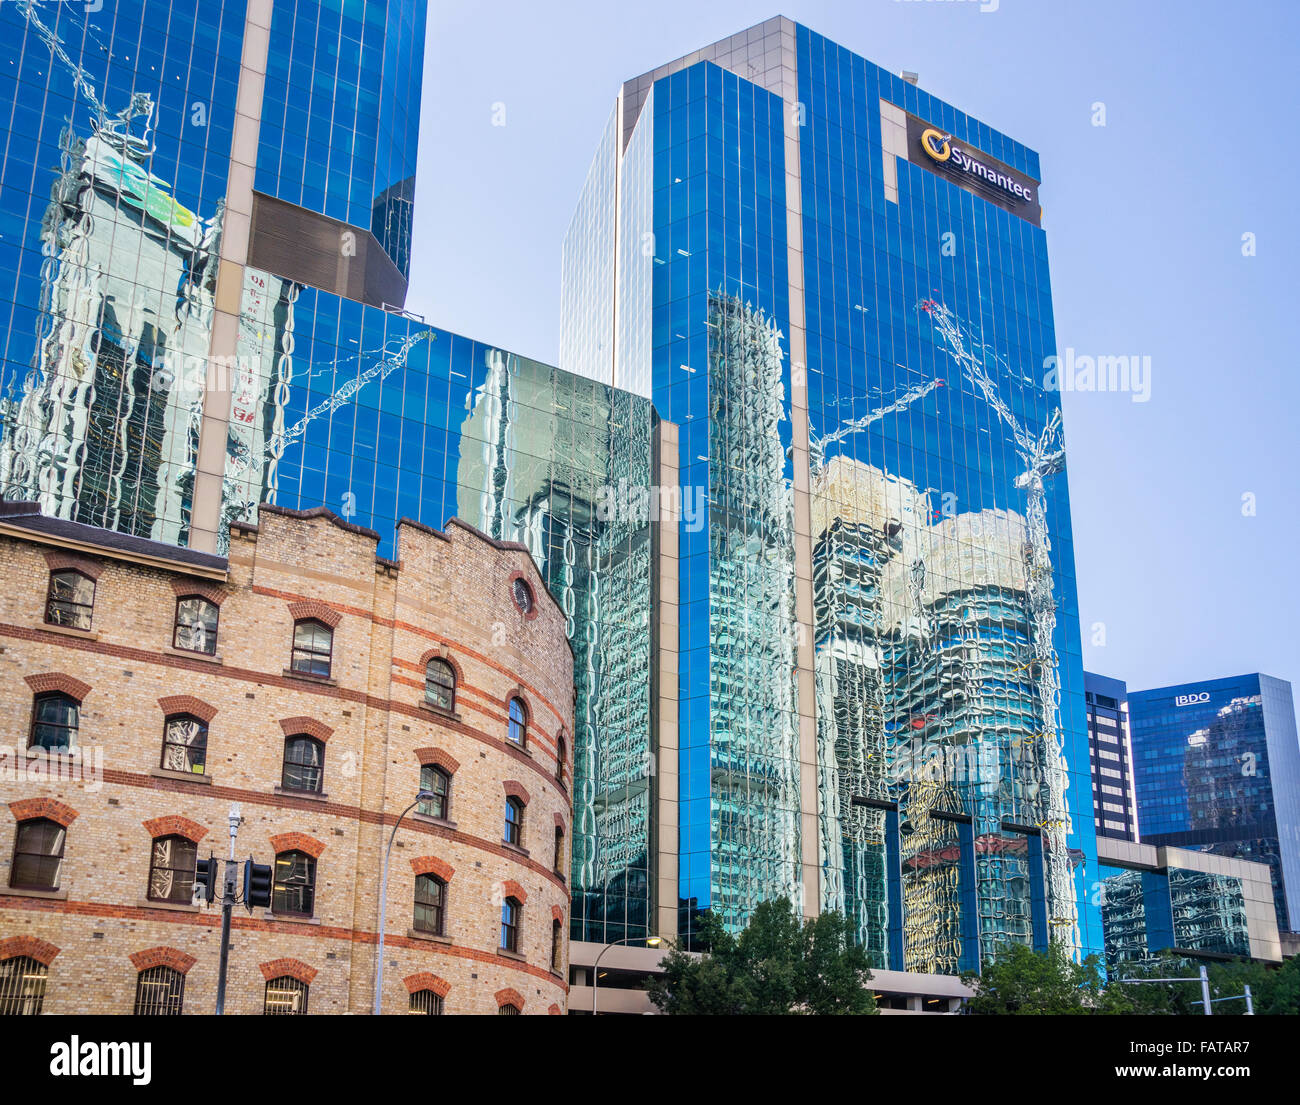 Australien, New South Wales, Sydney, die Erbe-Fassade des Grafton Bond gegen die Maritime Trade Towers Stockbild